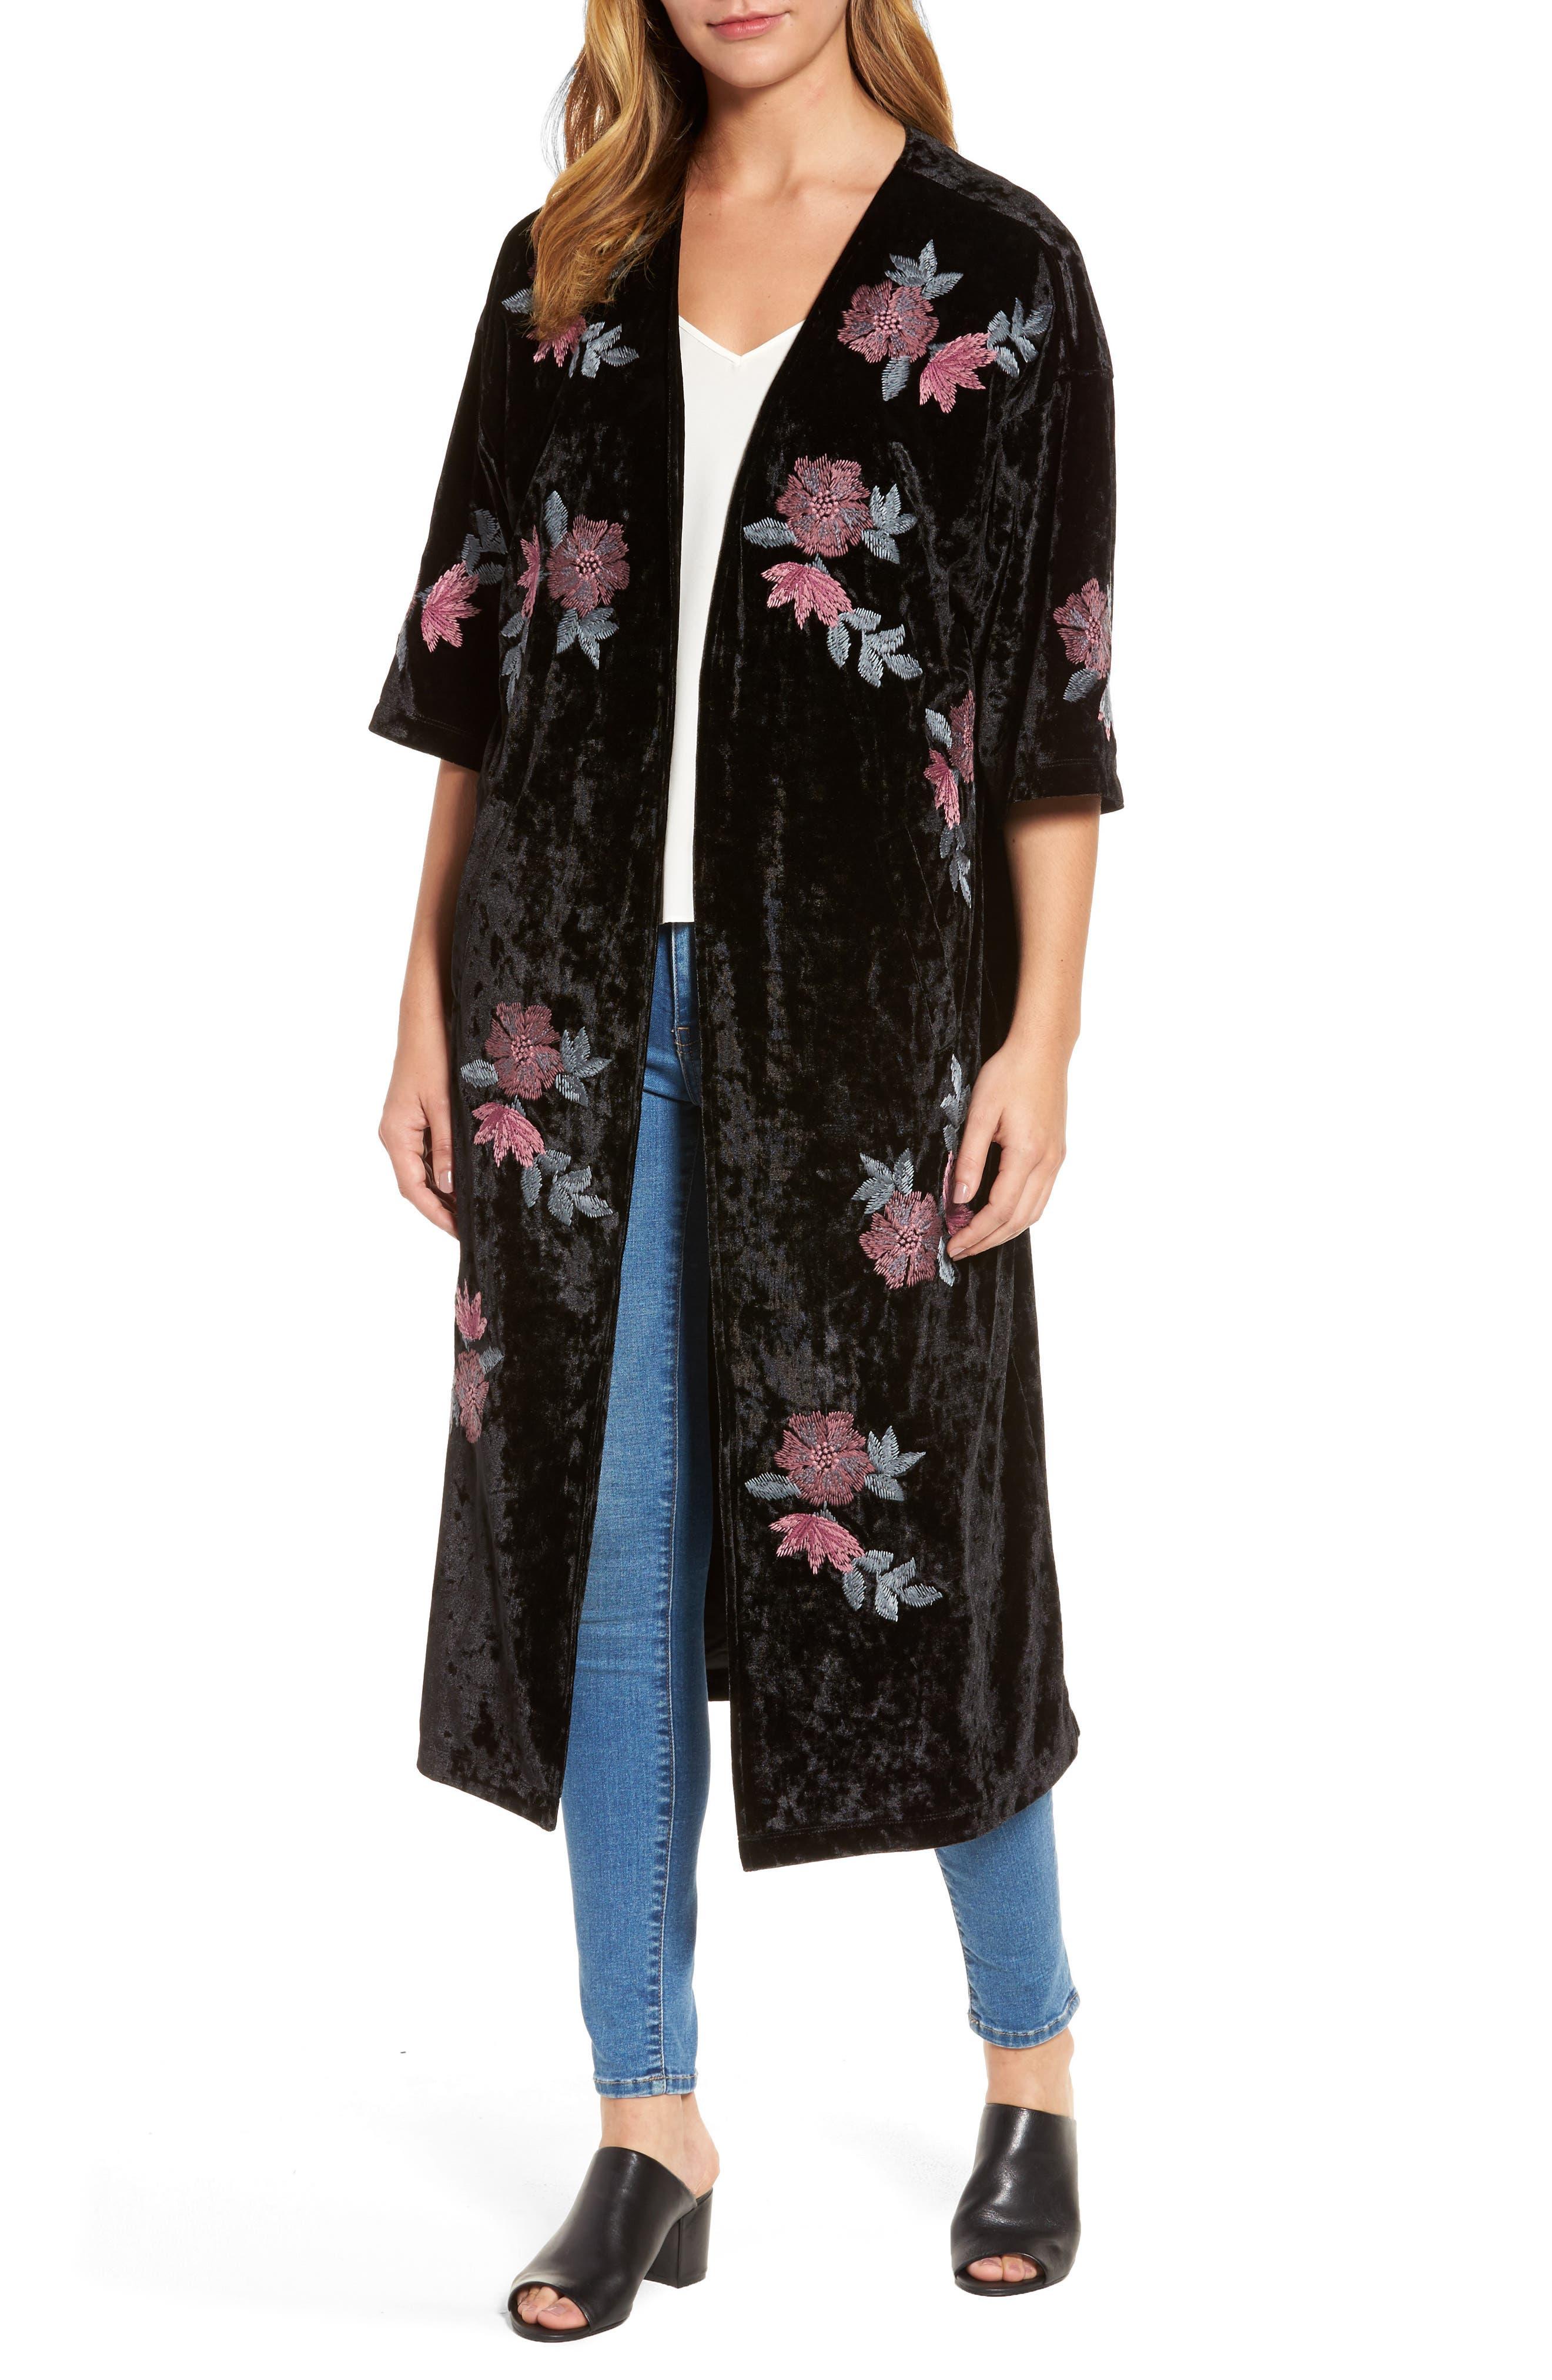 Billy T Floral Velvet Long Jacket